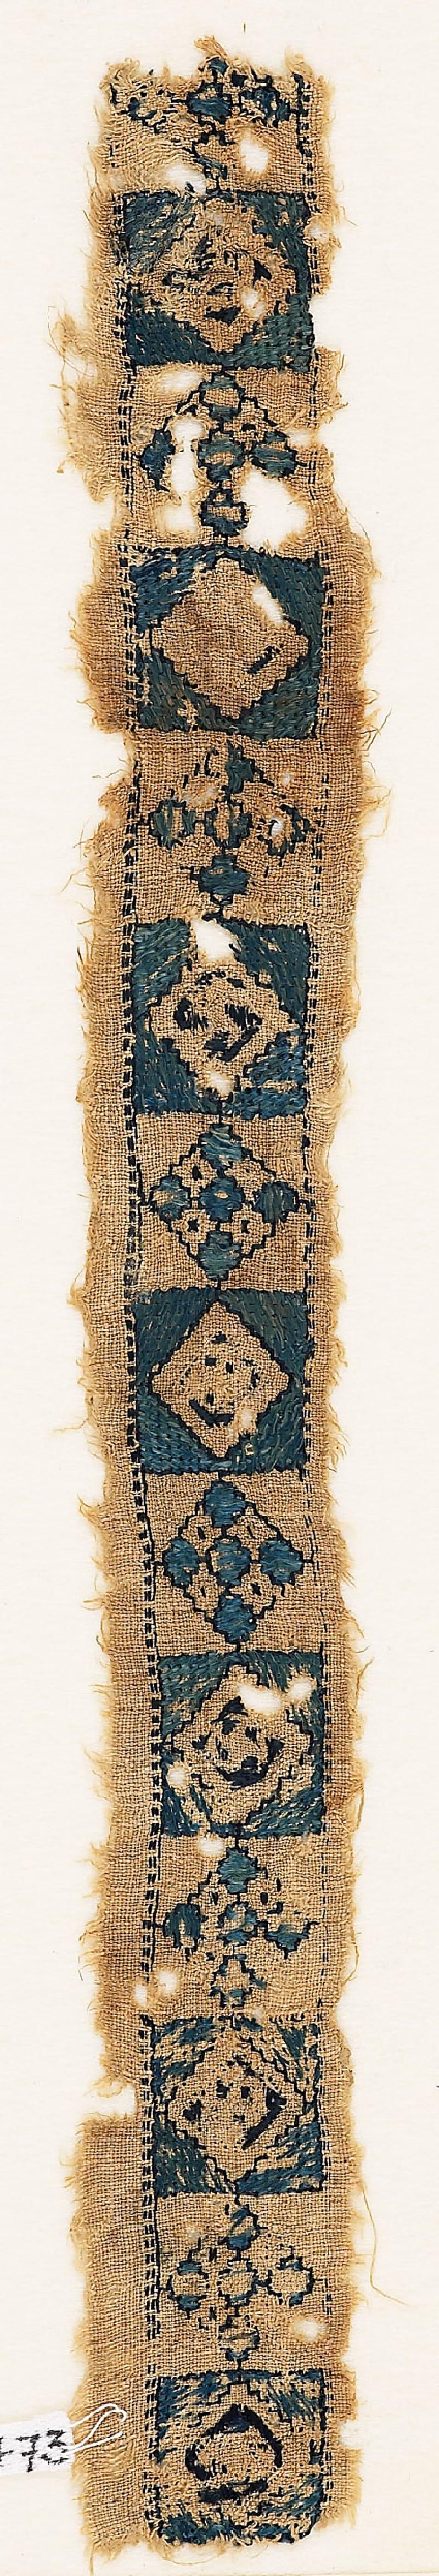 Textile fragment with alternating diamond-shapes and quatrefoils